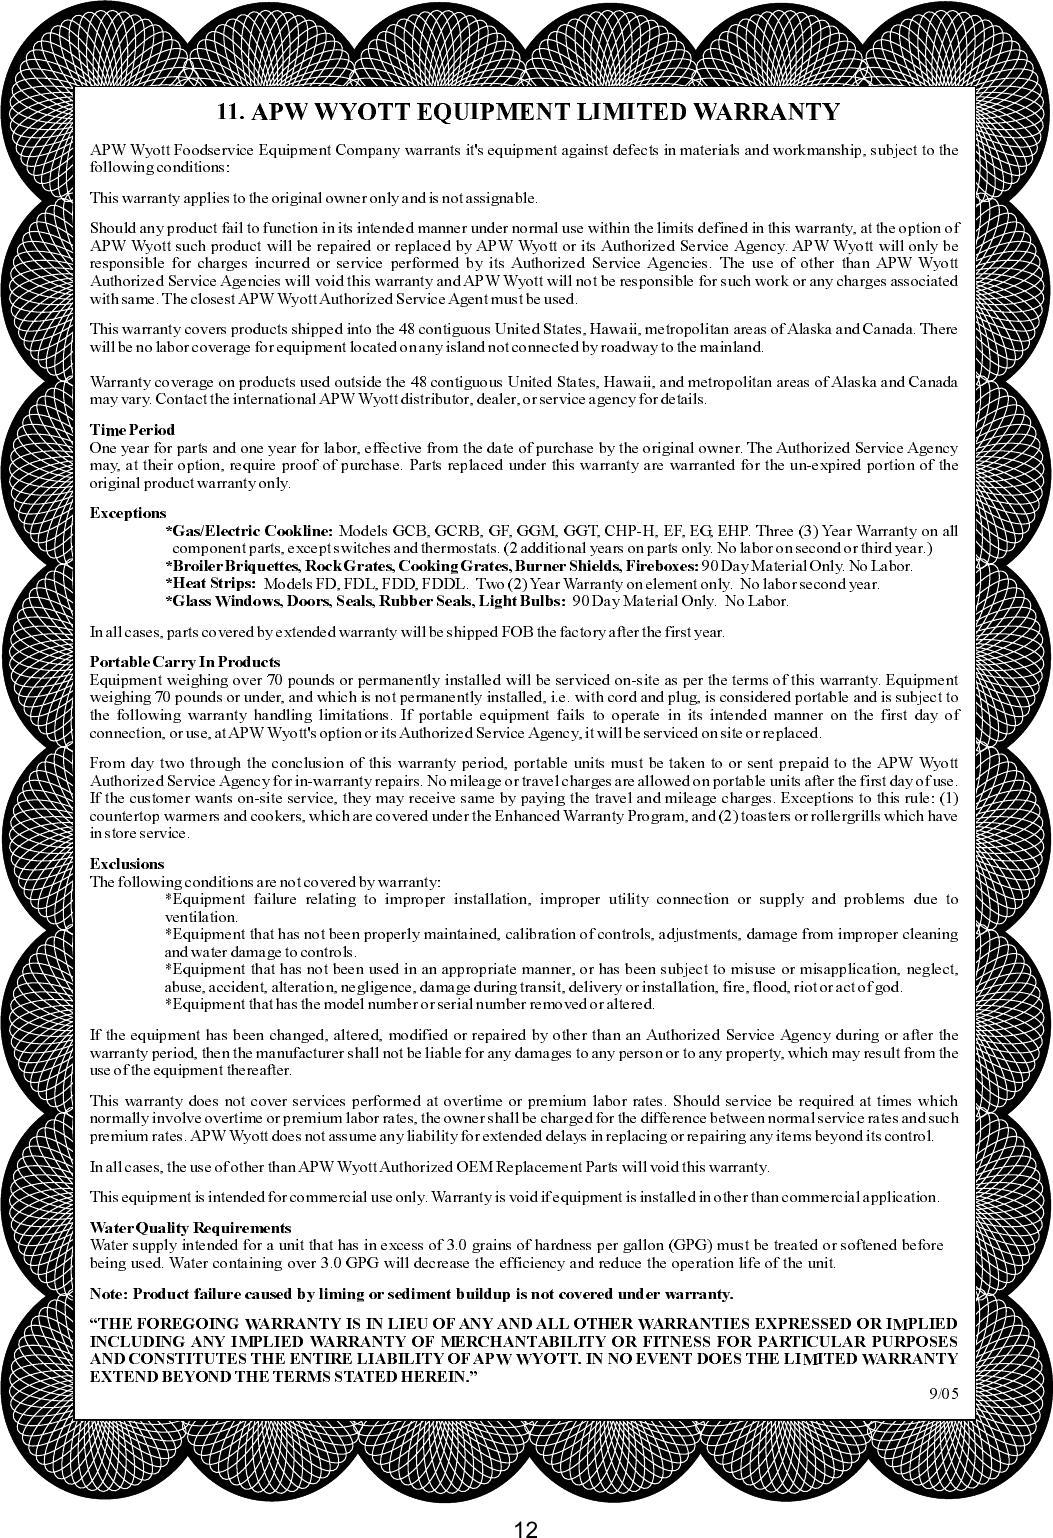 Apw Wyott M95 2 Jib Users Manual A Wiring Diagram Page 12 Of